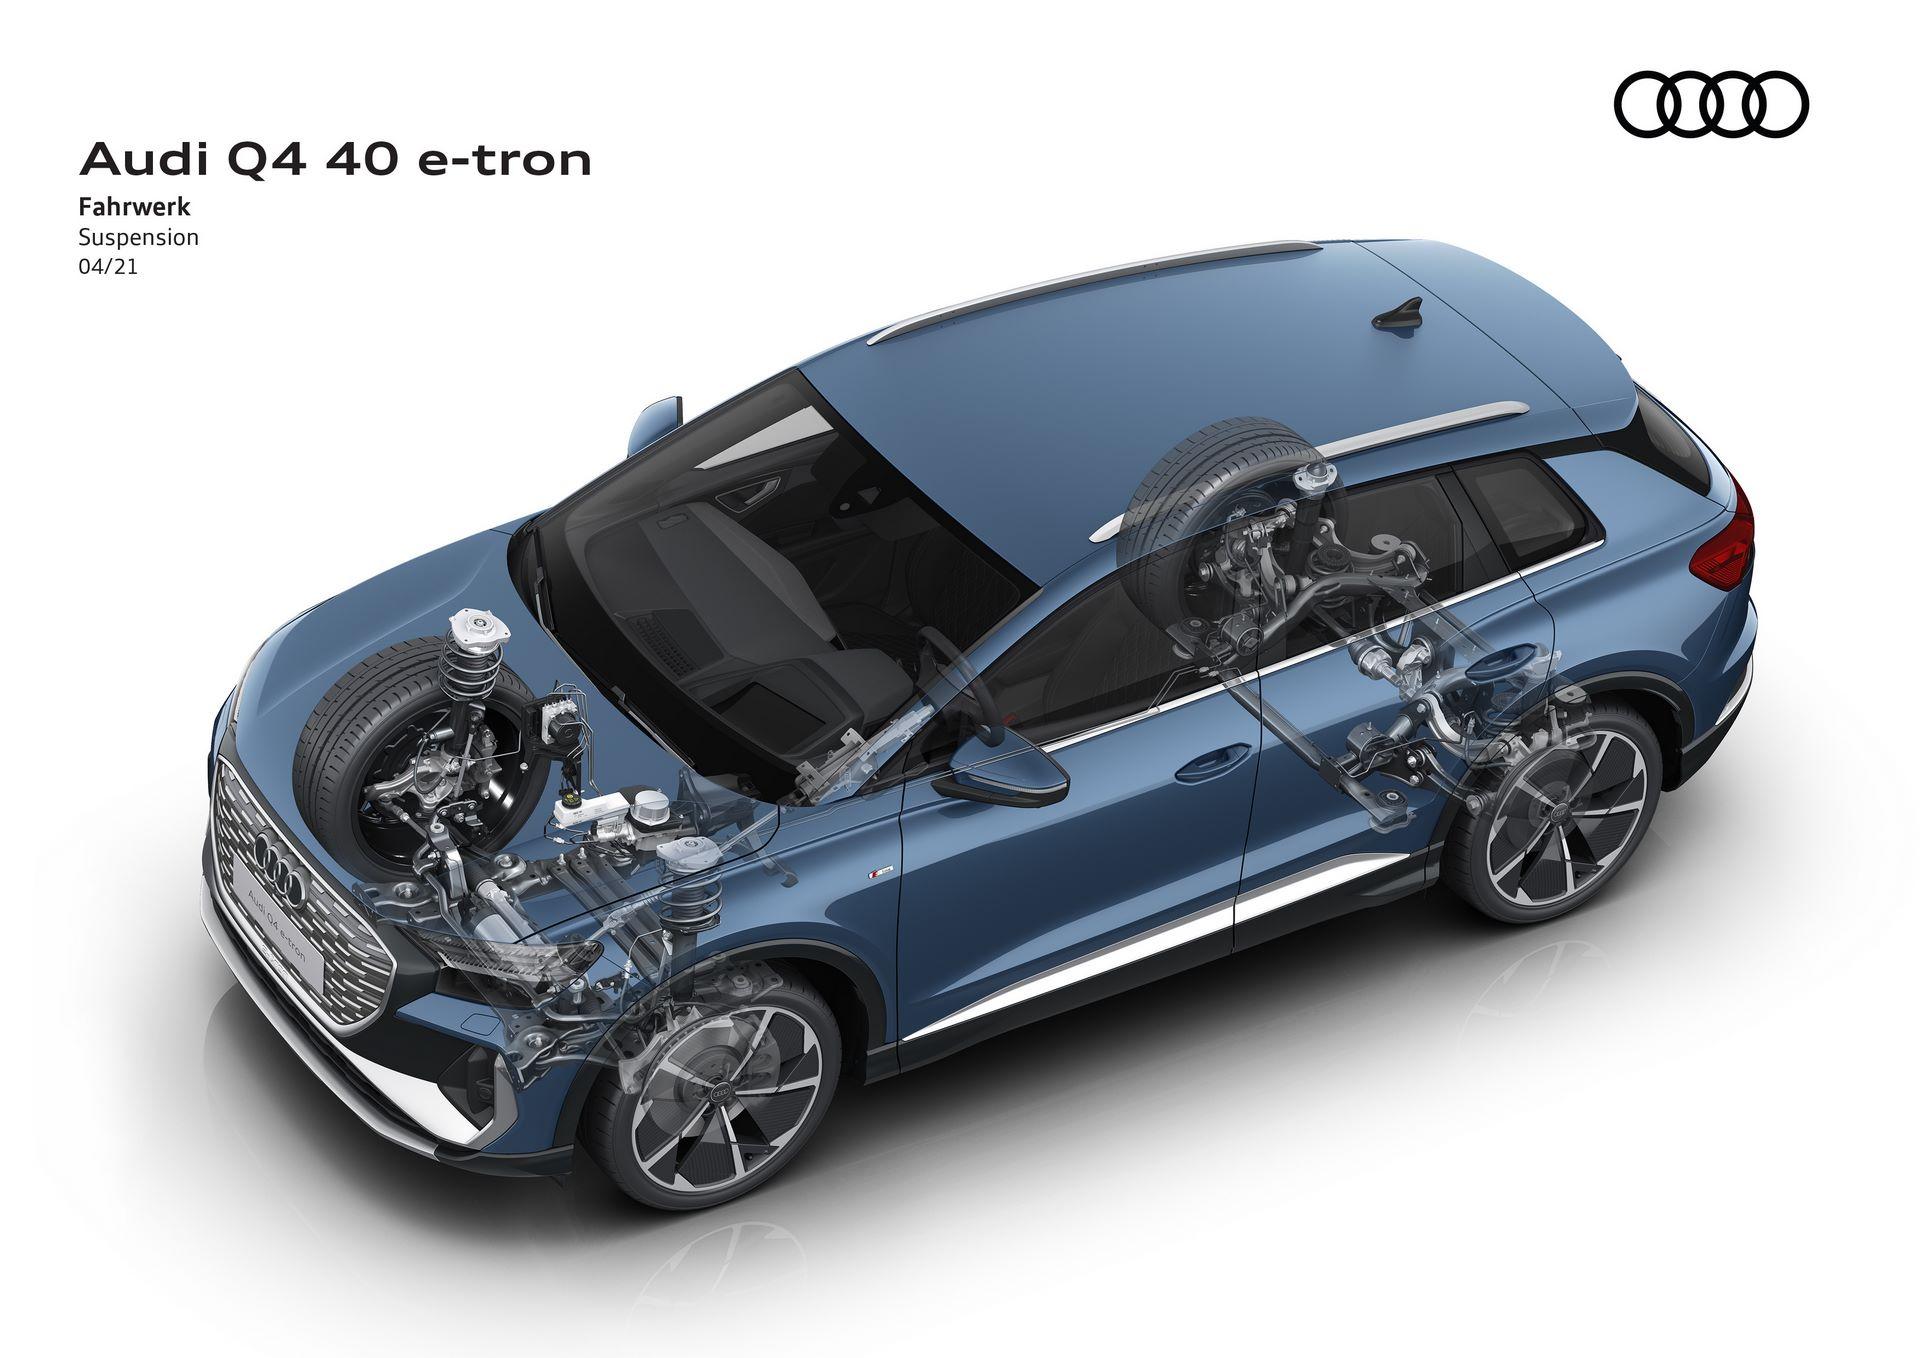 Audi-Q4-e-tron-and-Q4-e-tron-Sportback-117